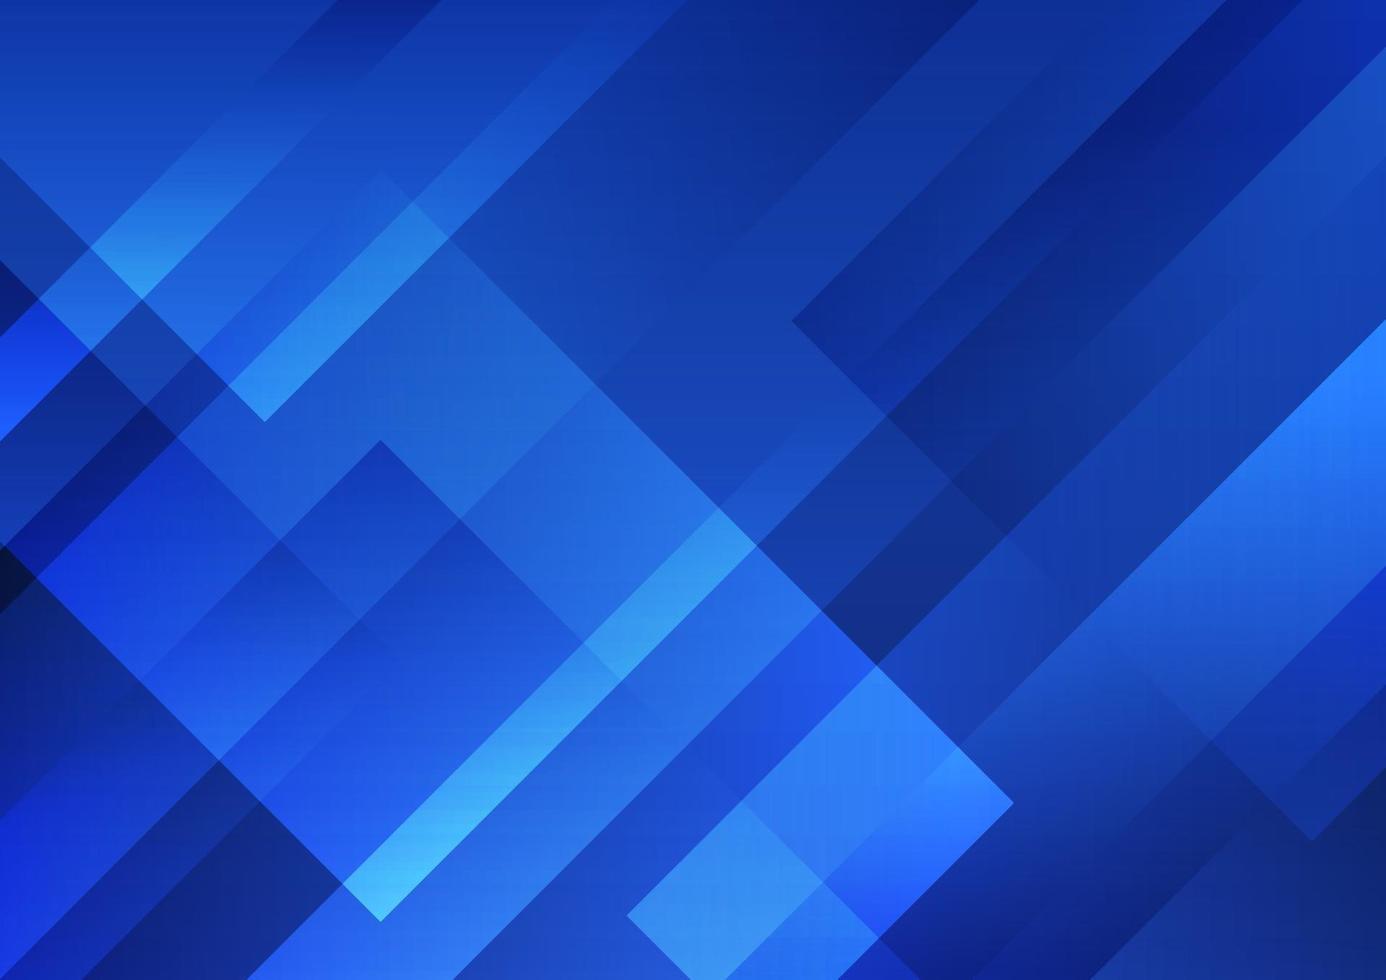 abstracte blauwe geometrische vorm overlay laag achtergrond technologie stijl. vector